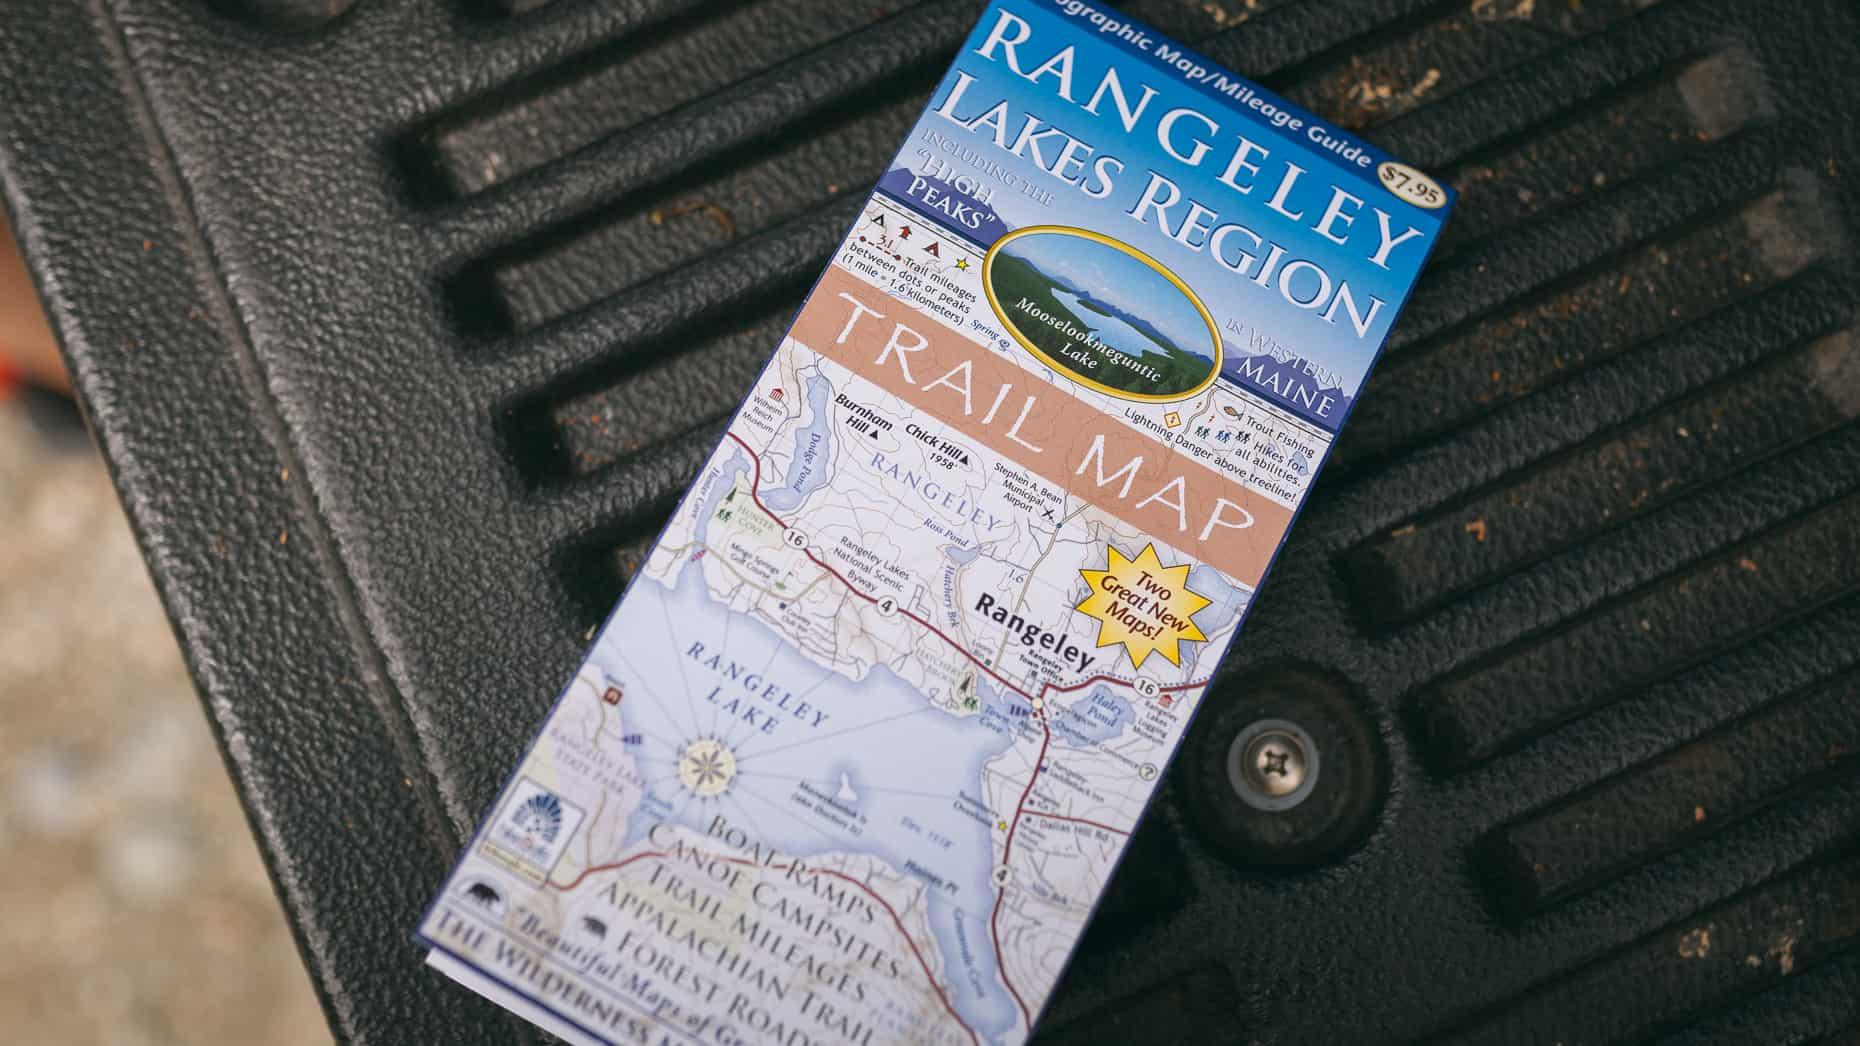 Rangeley Lakes Region trail map.